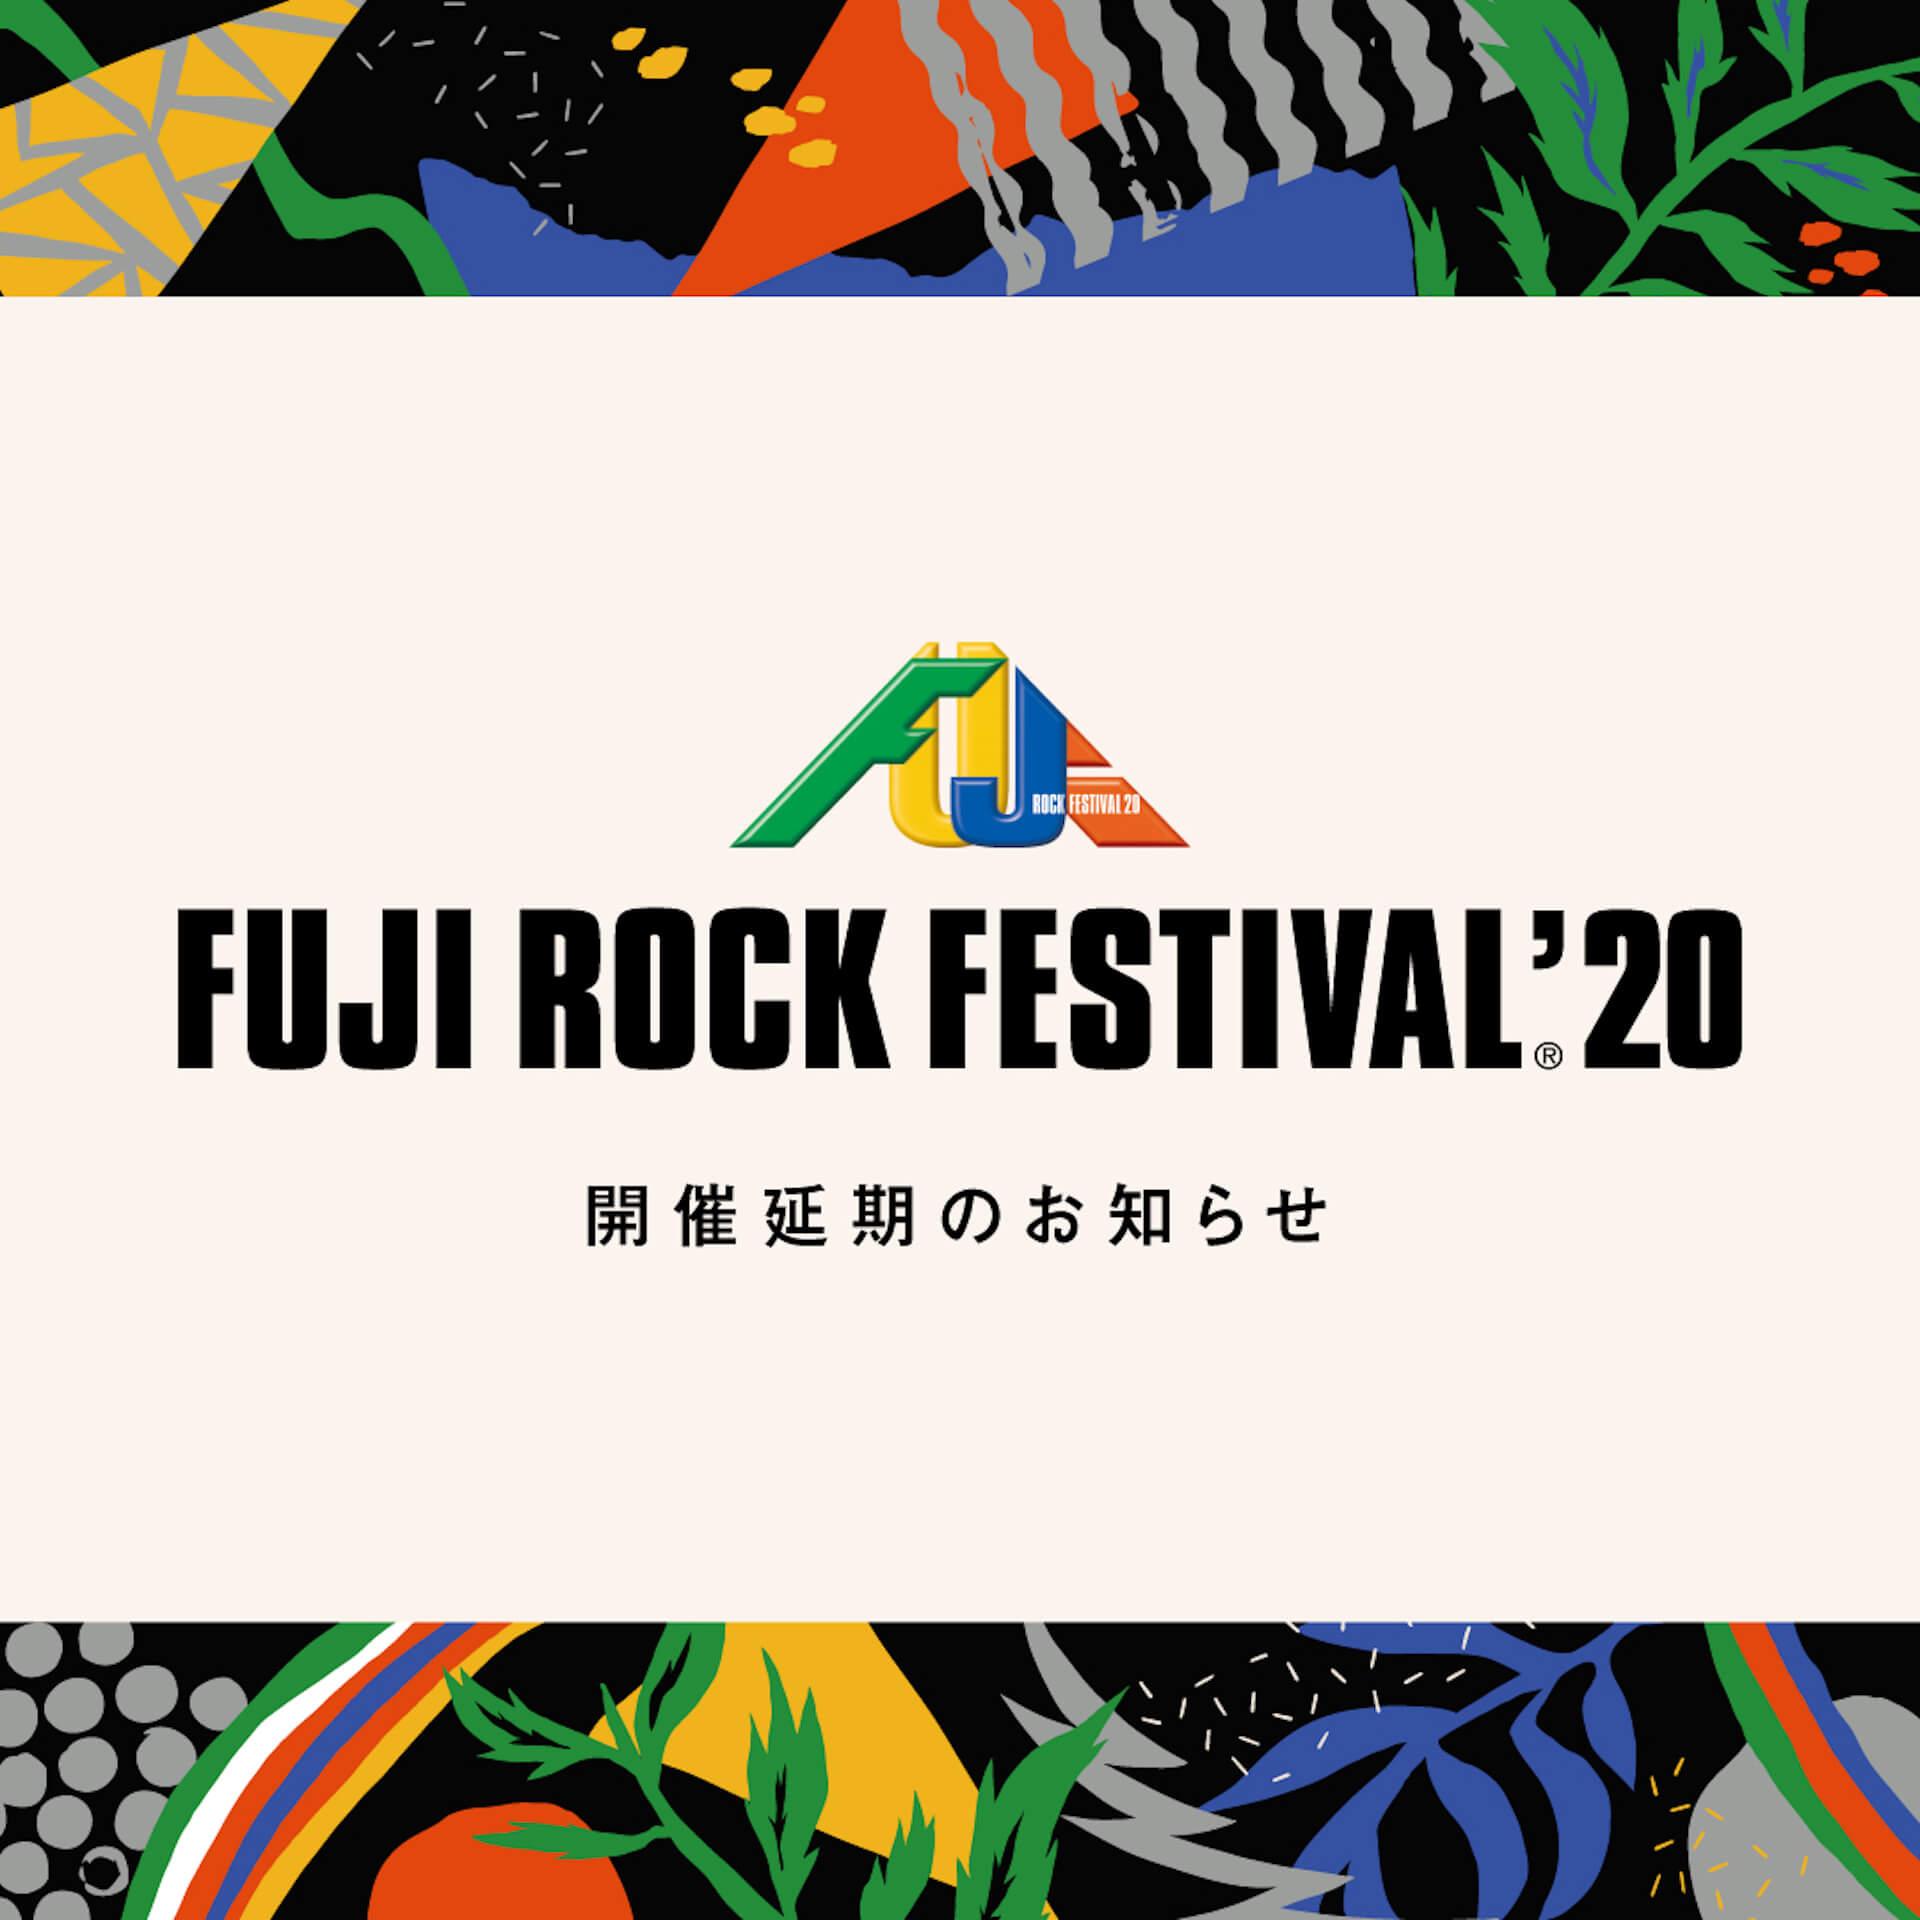 <FUJI ROCK FESTIVAL '20>、2021年に開催延期が決定|今年のチケットは来年も有効「来年の8月に苗場で」 music200605_fujirockfestival_main